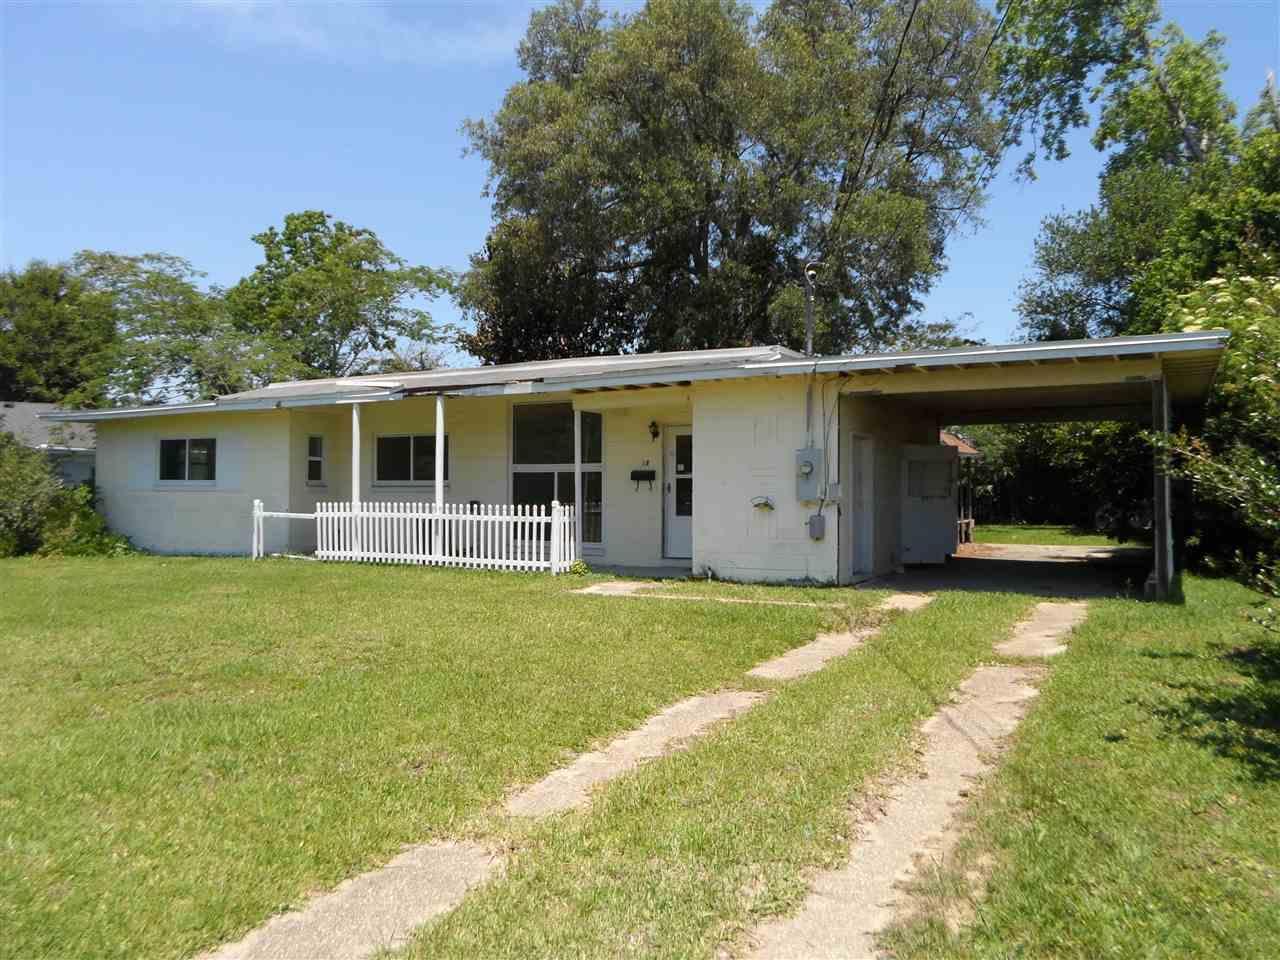 18 EATON RD, PENSACOLA, FL 32526